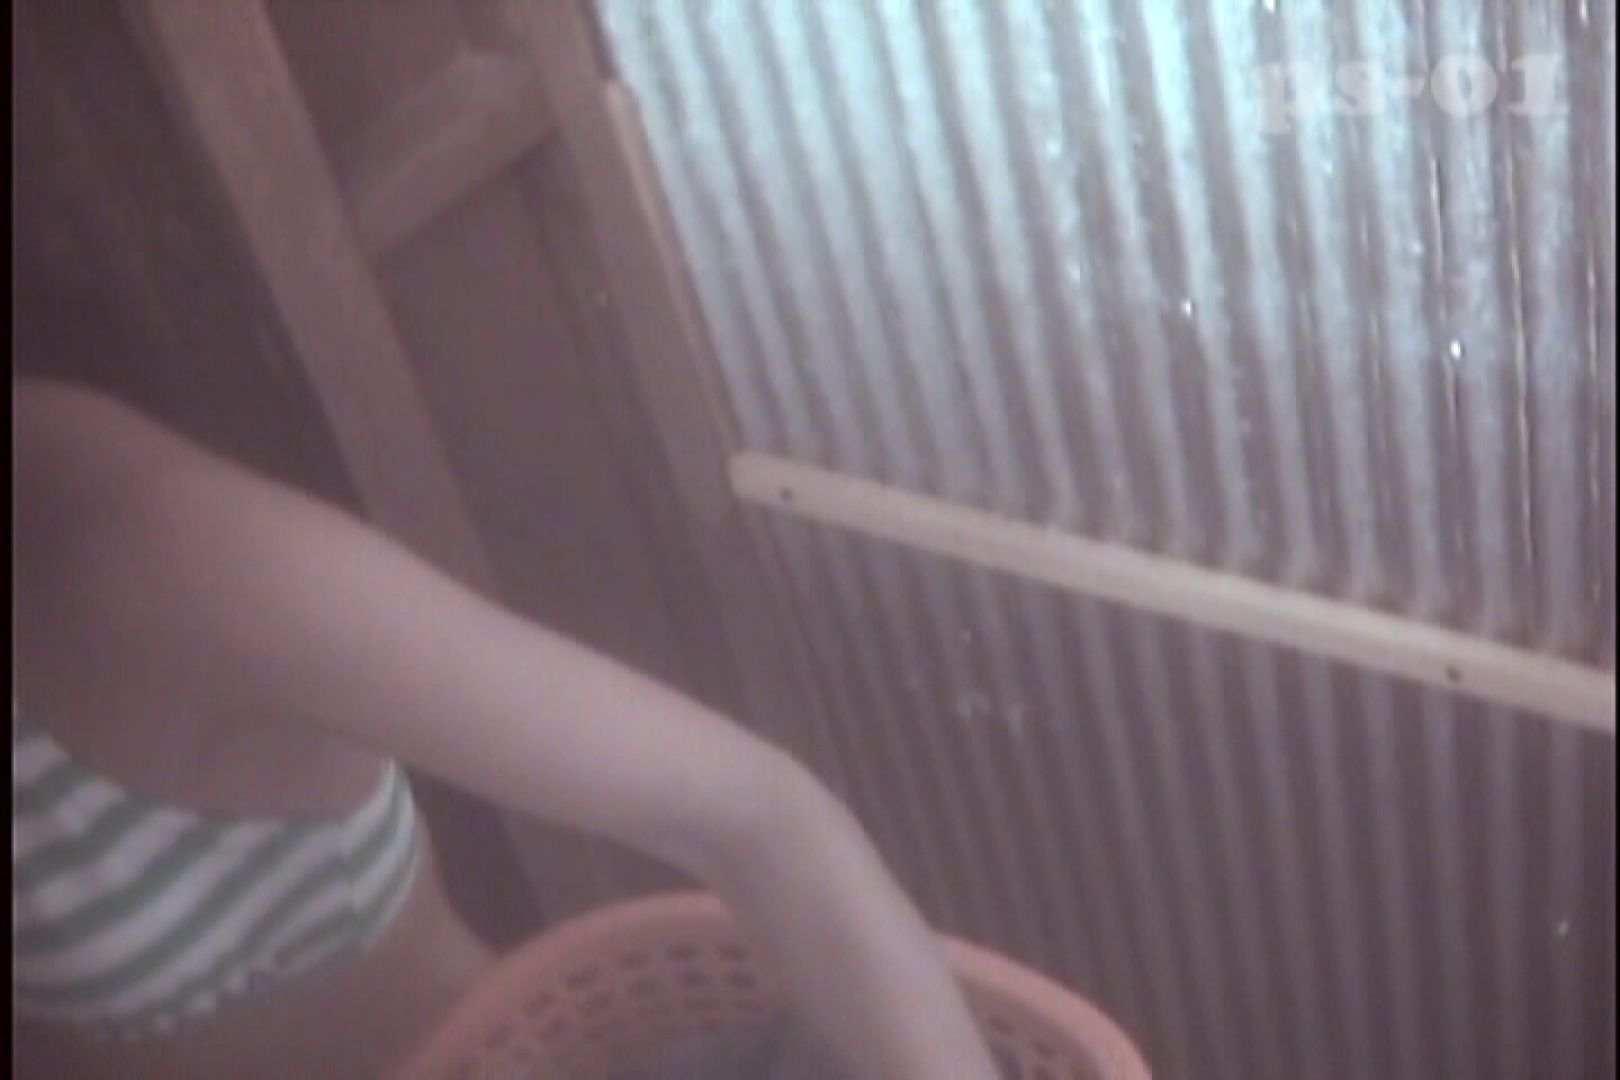 File.03 ぱっと見若いけど、お腹のたるみが出産経験を物語る。 盗撮エロすぎ | シャワー中  88連発 19